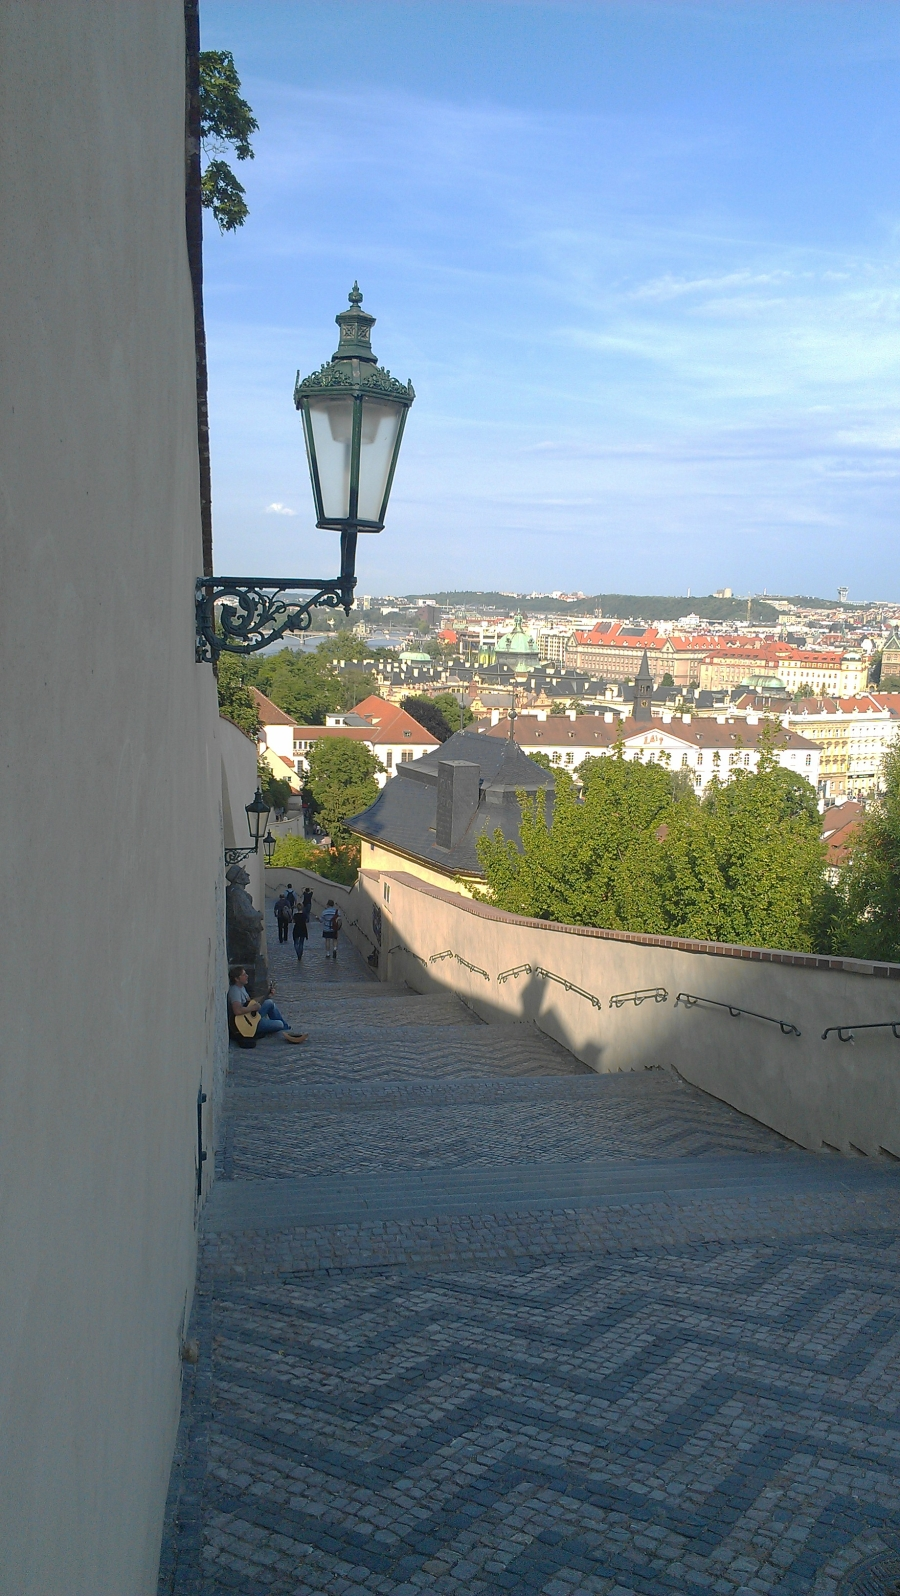 Man playing guitar on stairs near St. Wenceslas vineyard, Prague, Czech Republic.